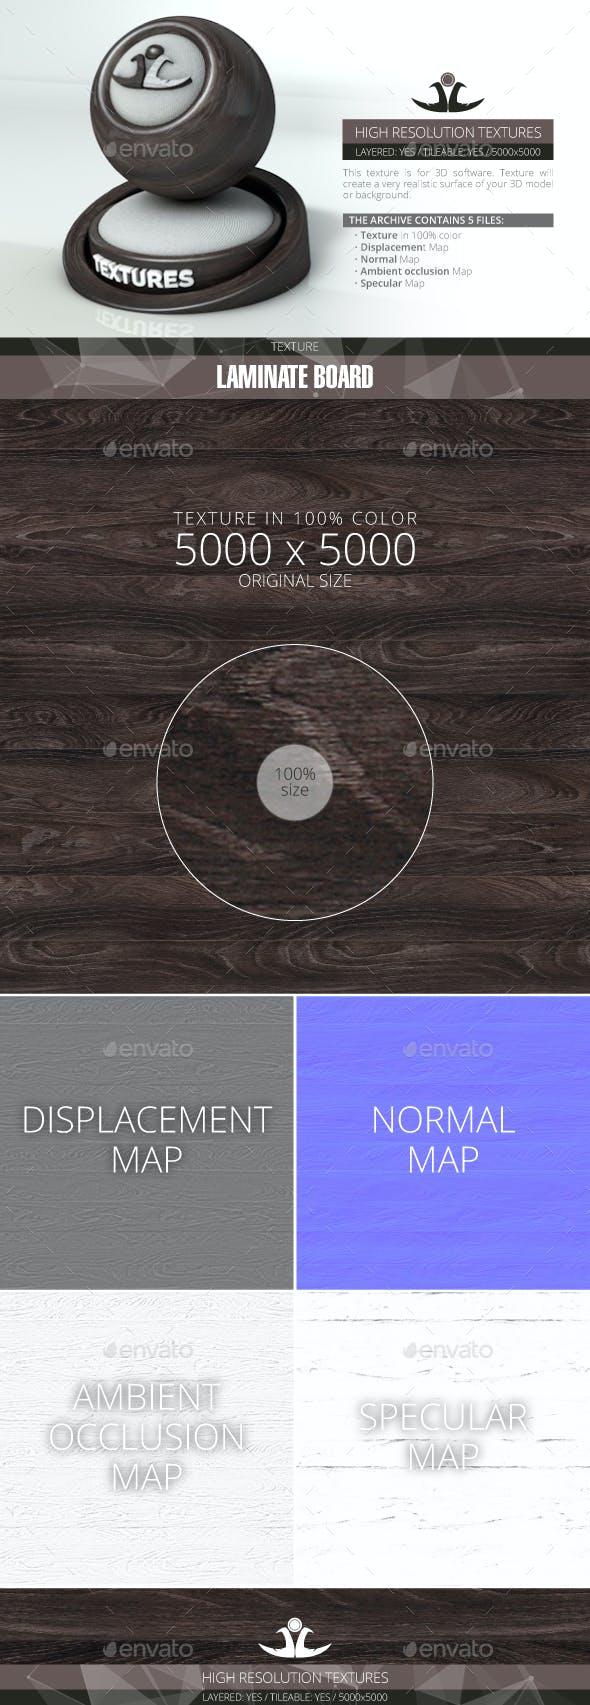 Laminate Board 8 - 3DOcean Item for Sale